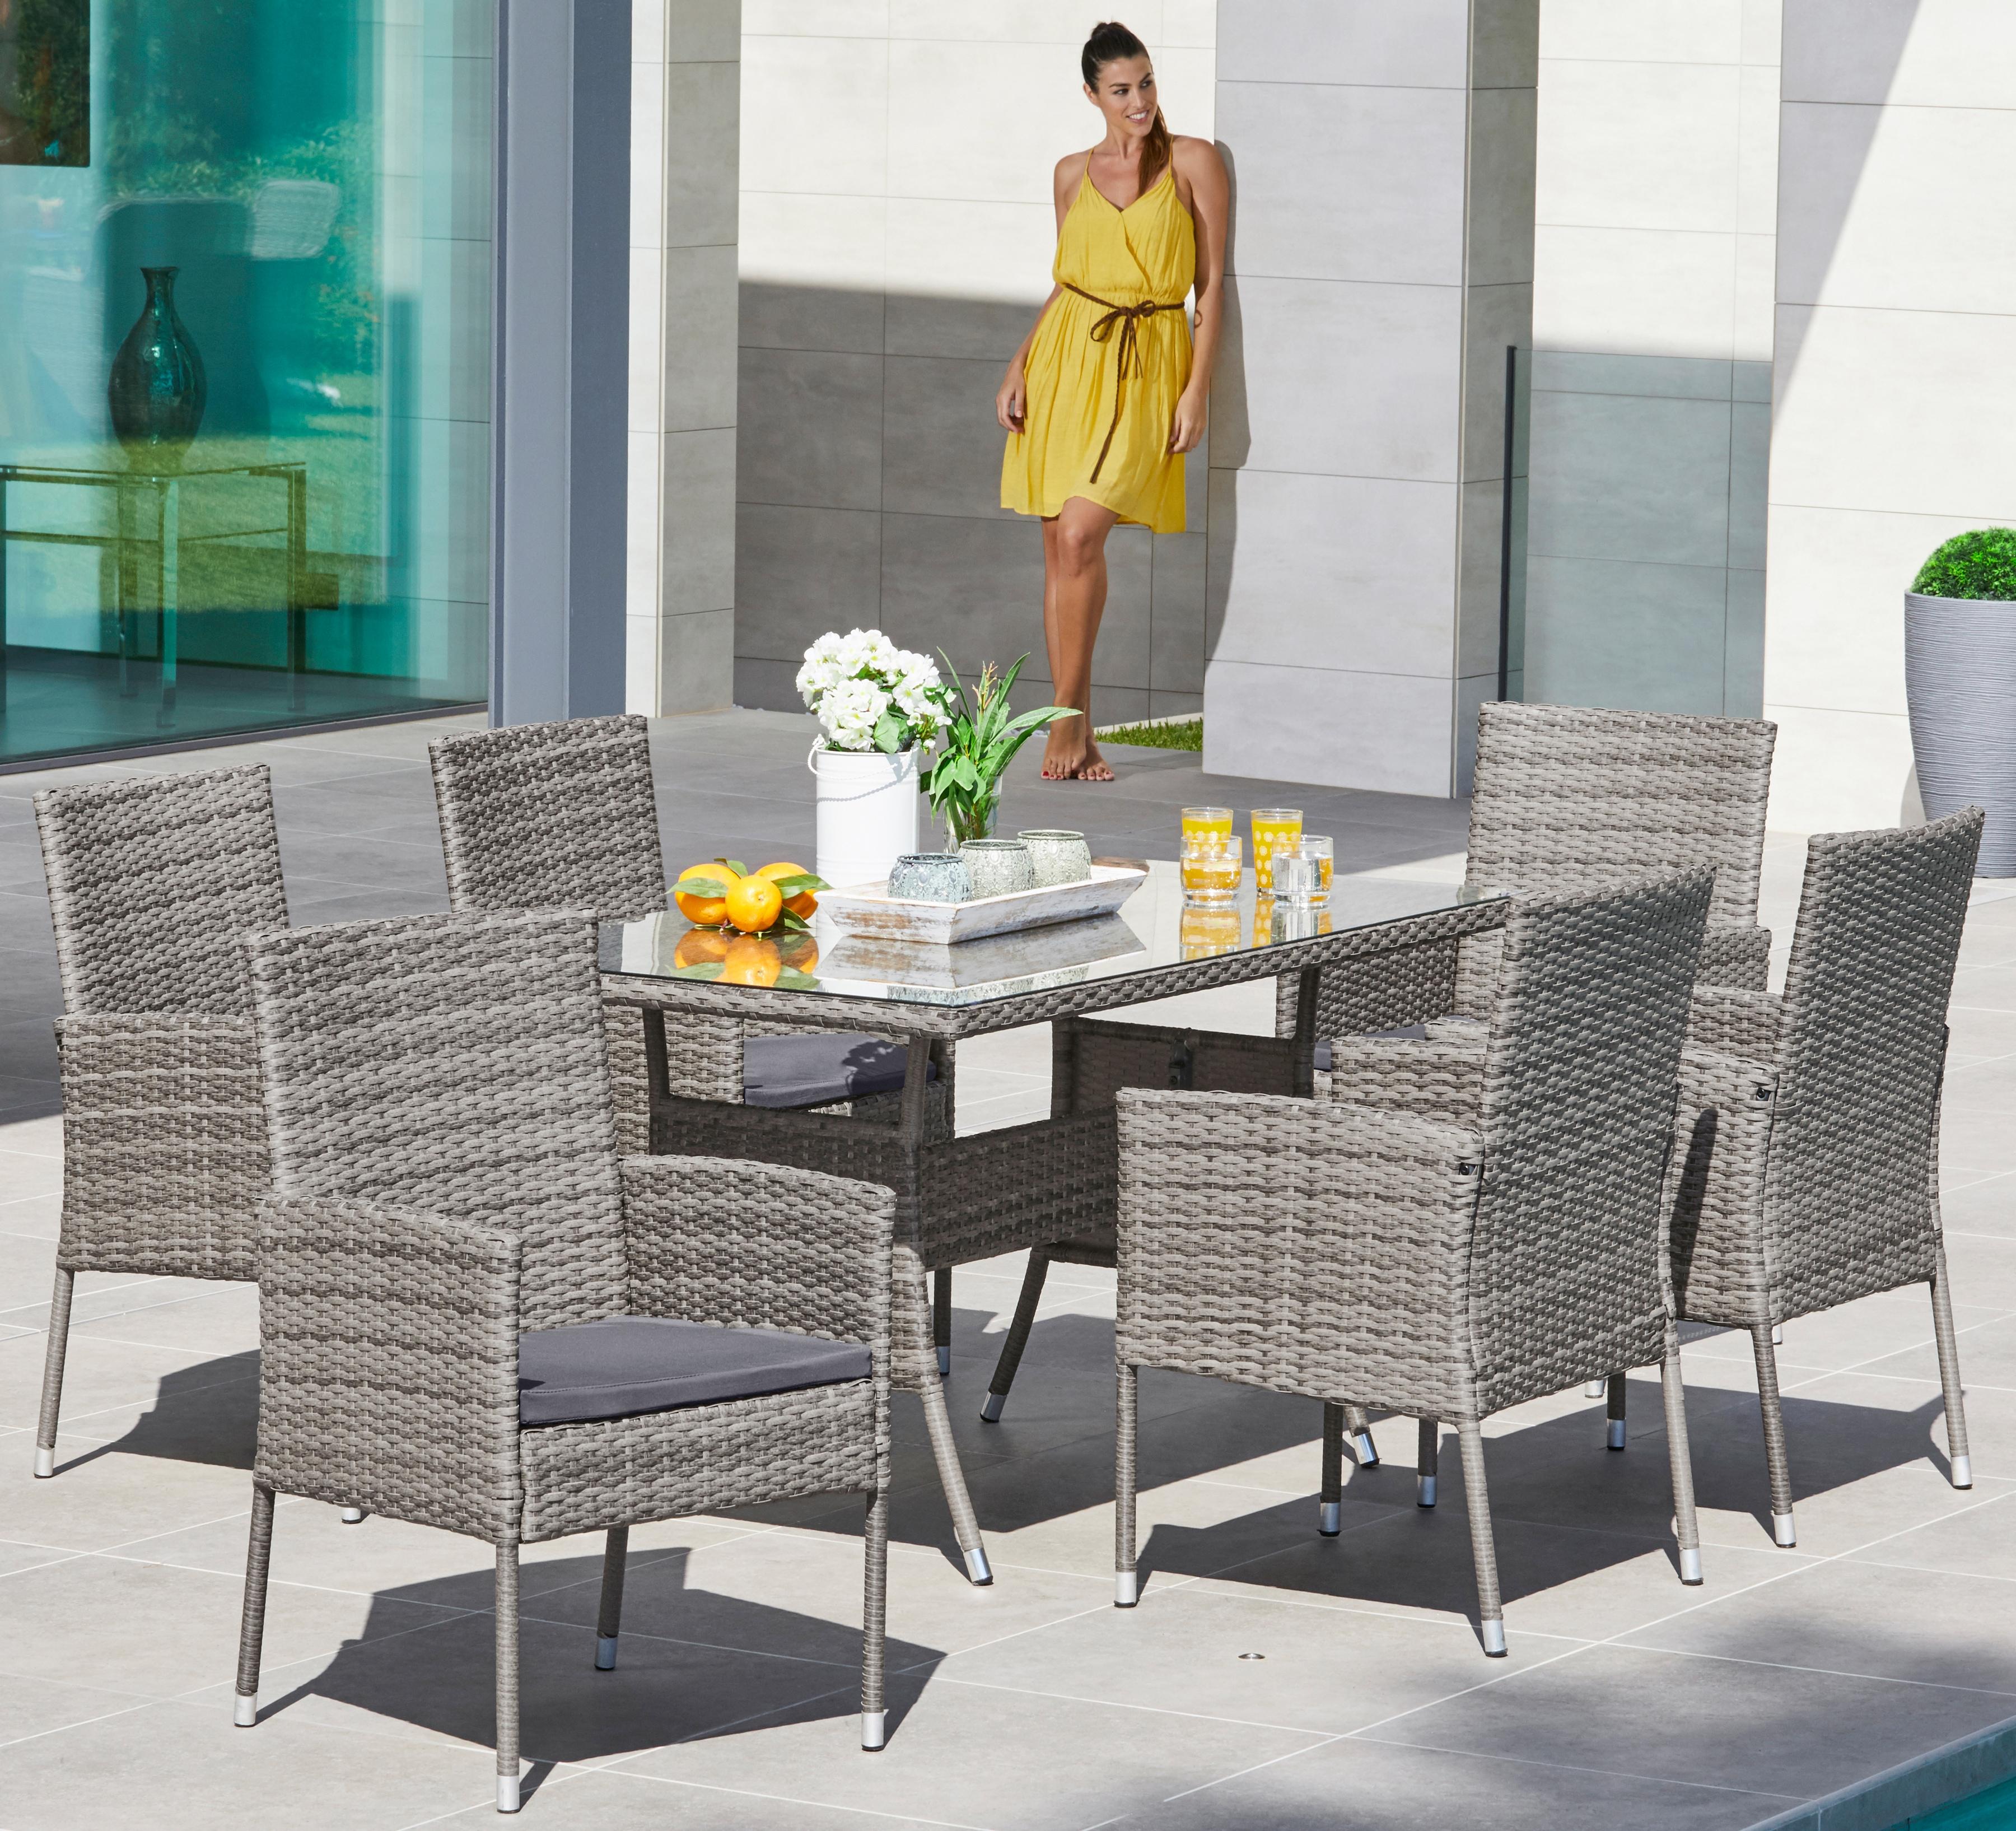 MERXX Gartenmöbelset Costa Rica 13-tlg 6 Sessel Tisch 140x80 cm Polyrattan